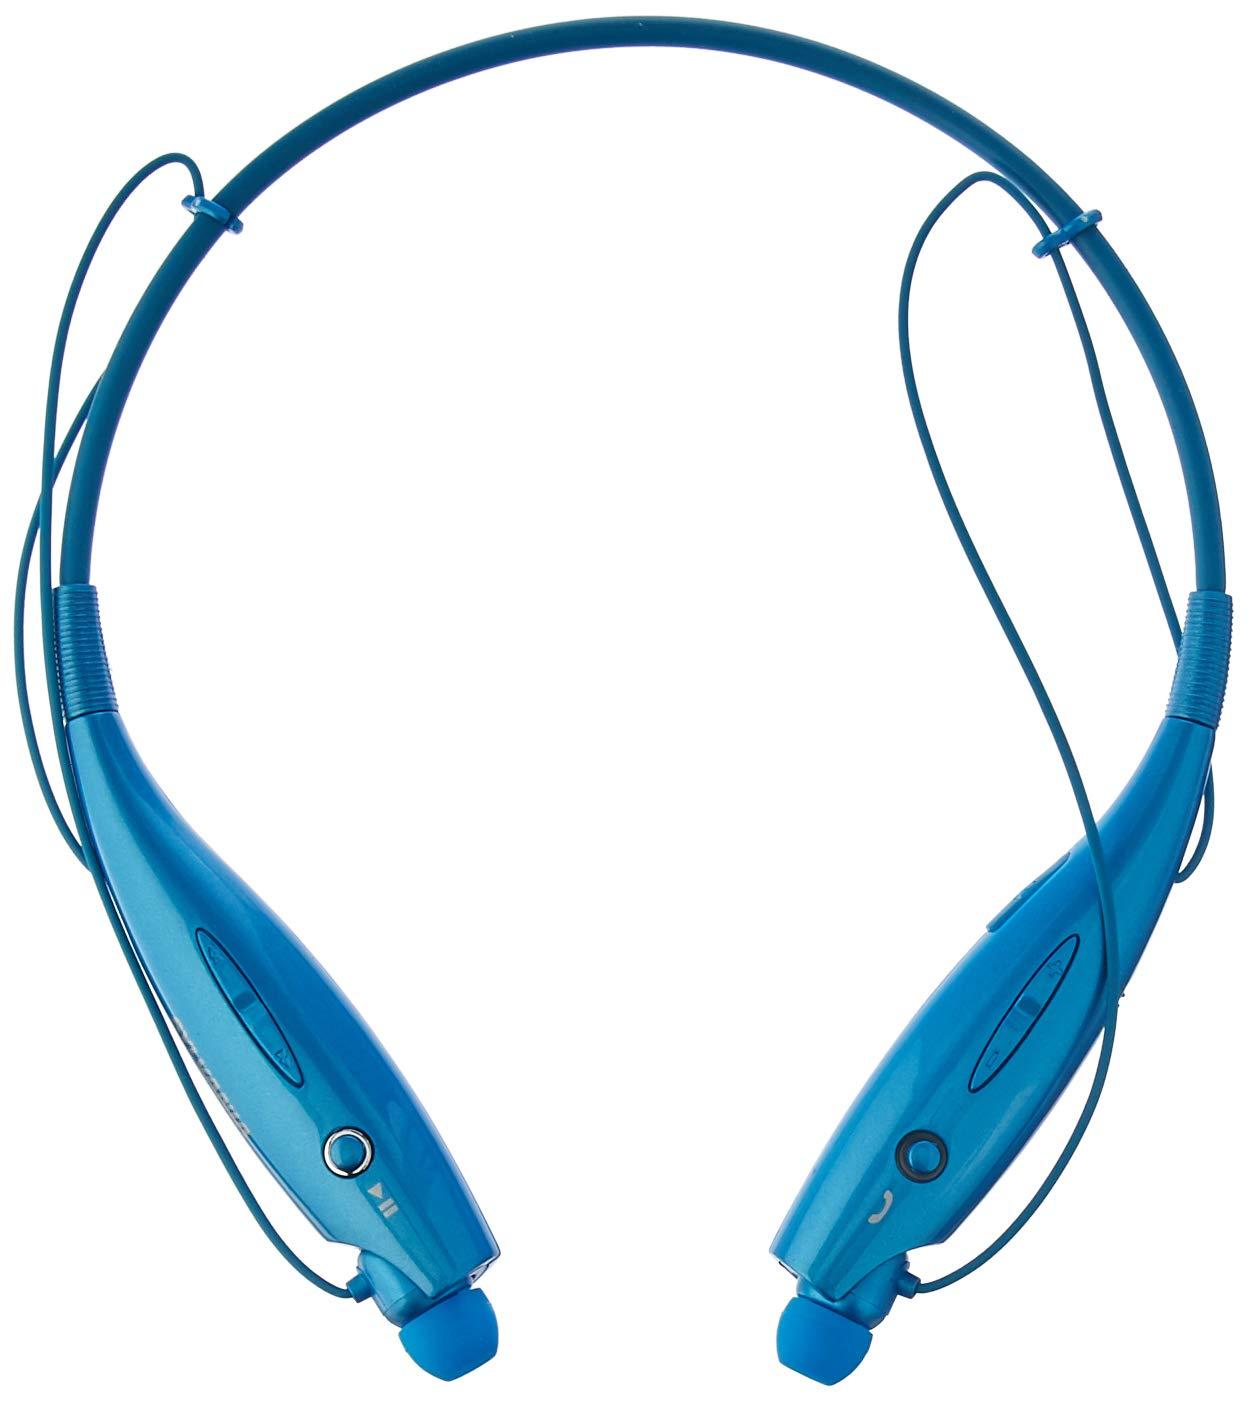 5d4dc9d0e66 Amazon.com: Sylvania SBT129-BLUE Sports Style Bluetooth Headphones (Blue):  Electronics